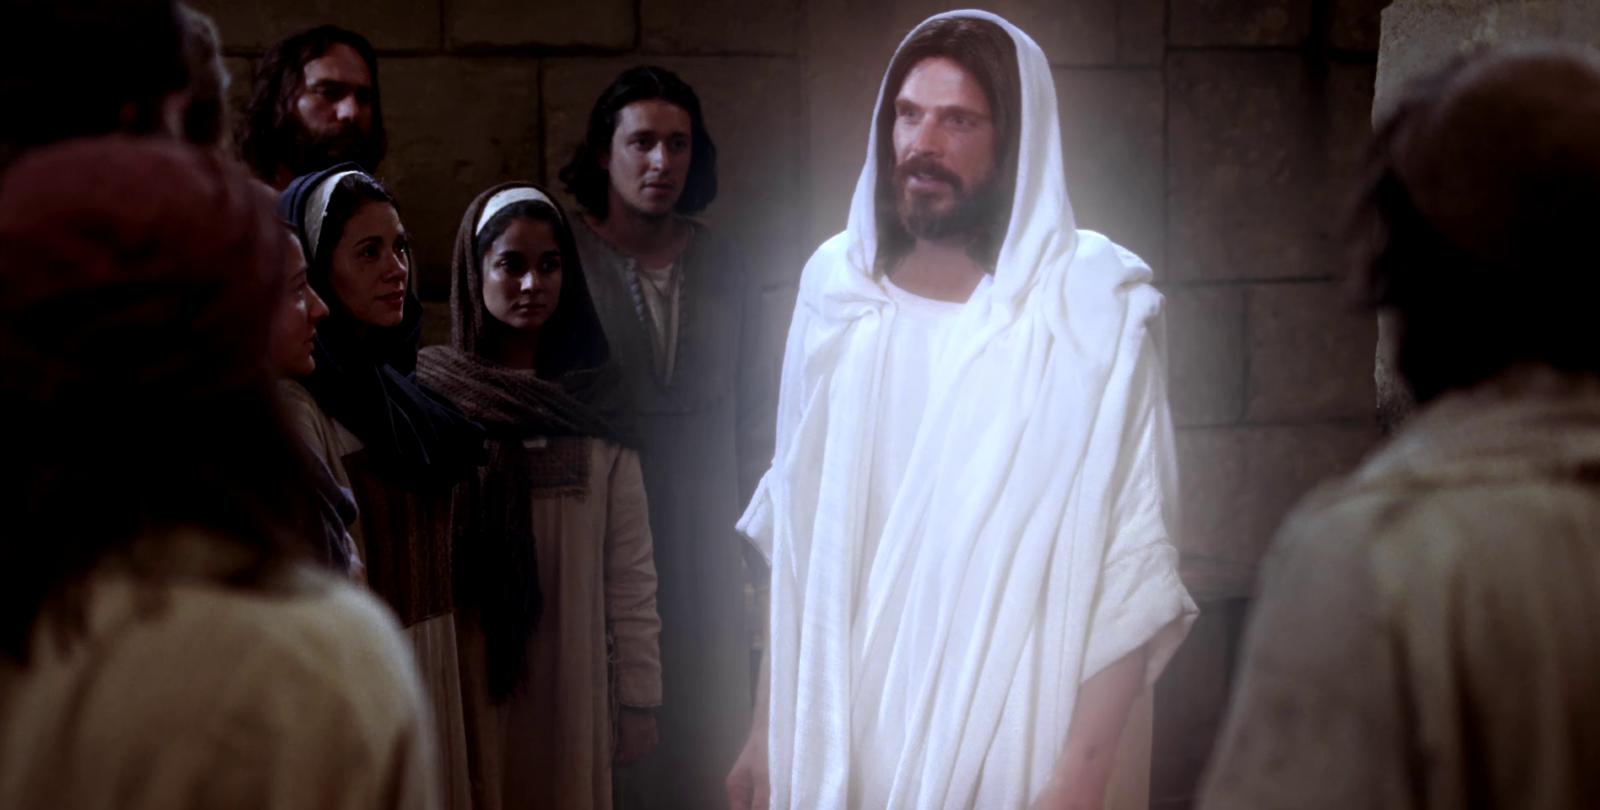 Jesus Resurrection Lds